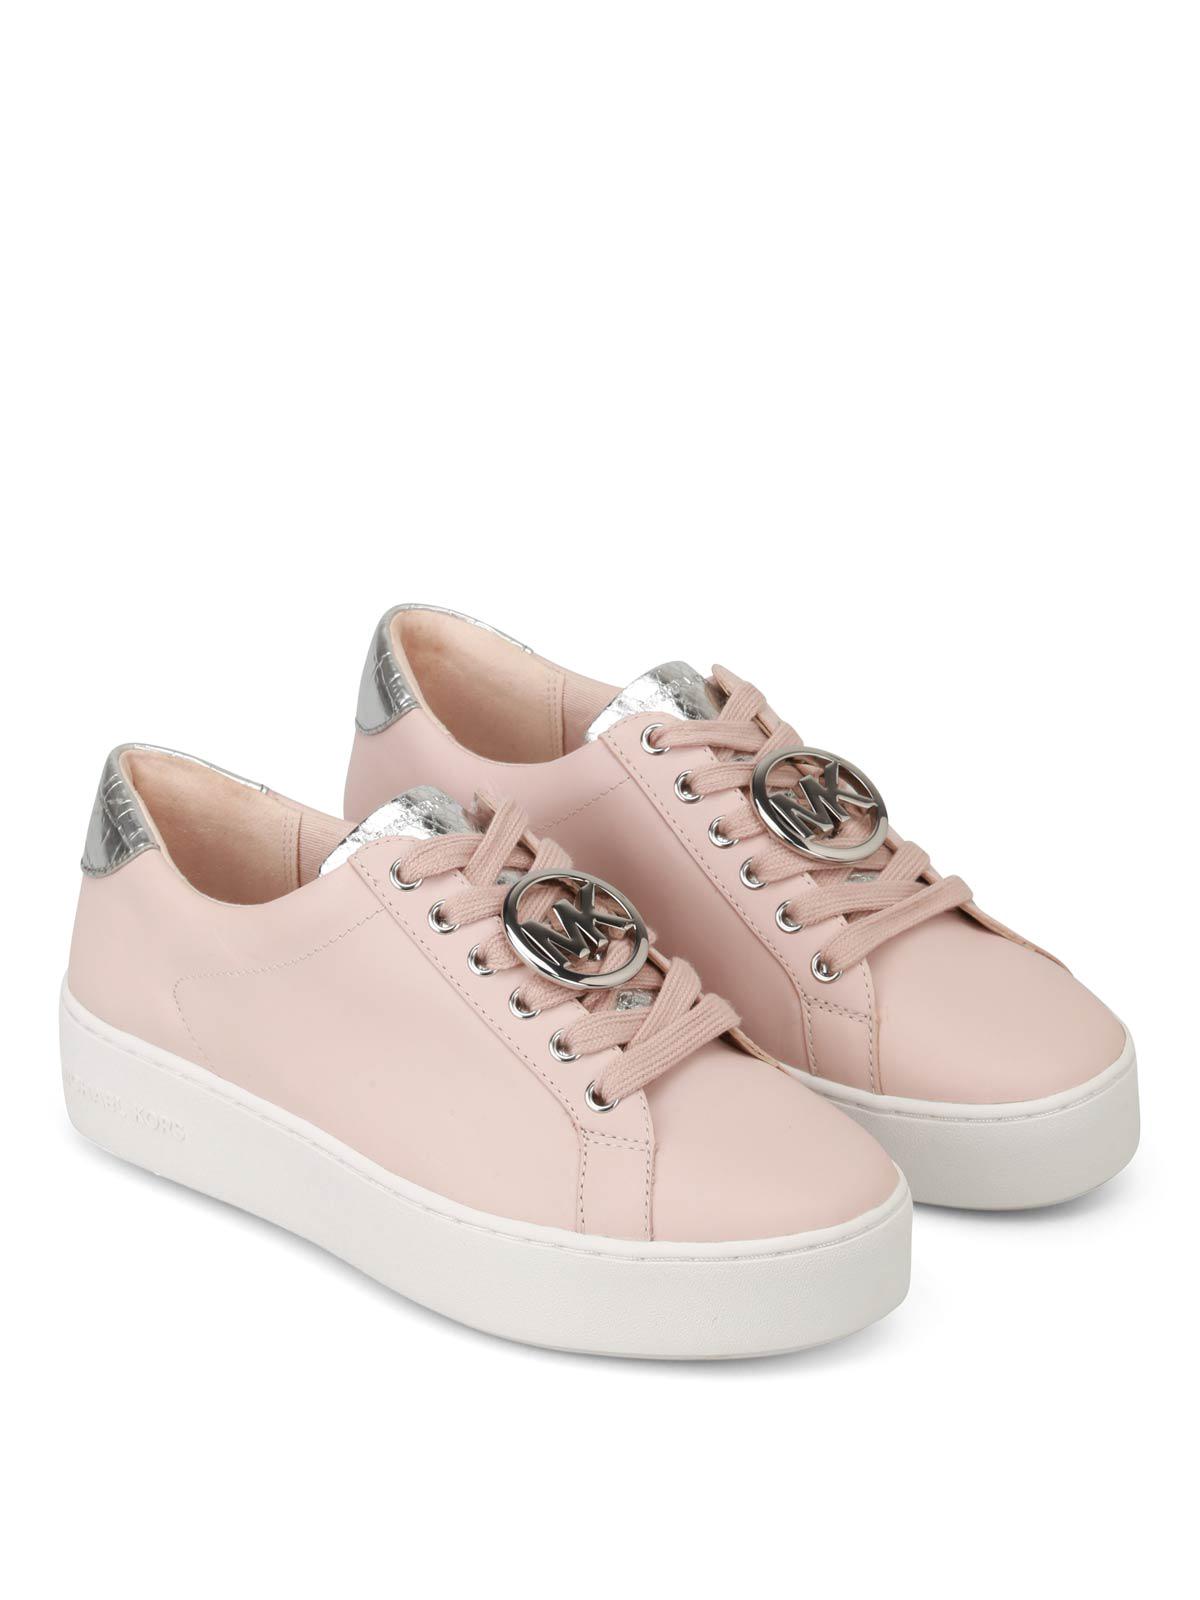 Michael Kors - Poppy soft pink leather